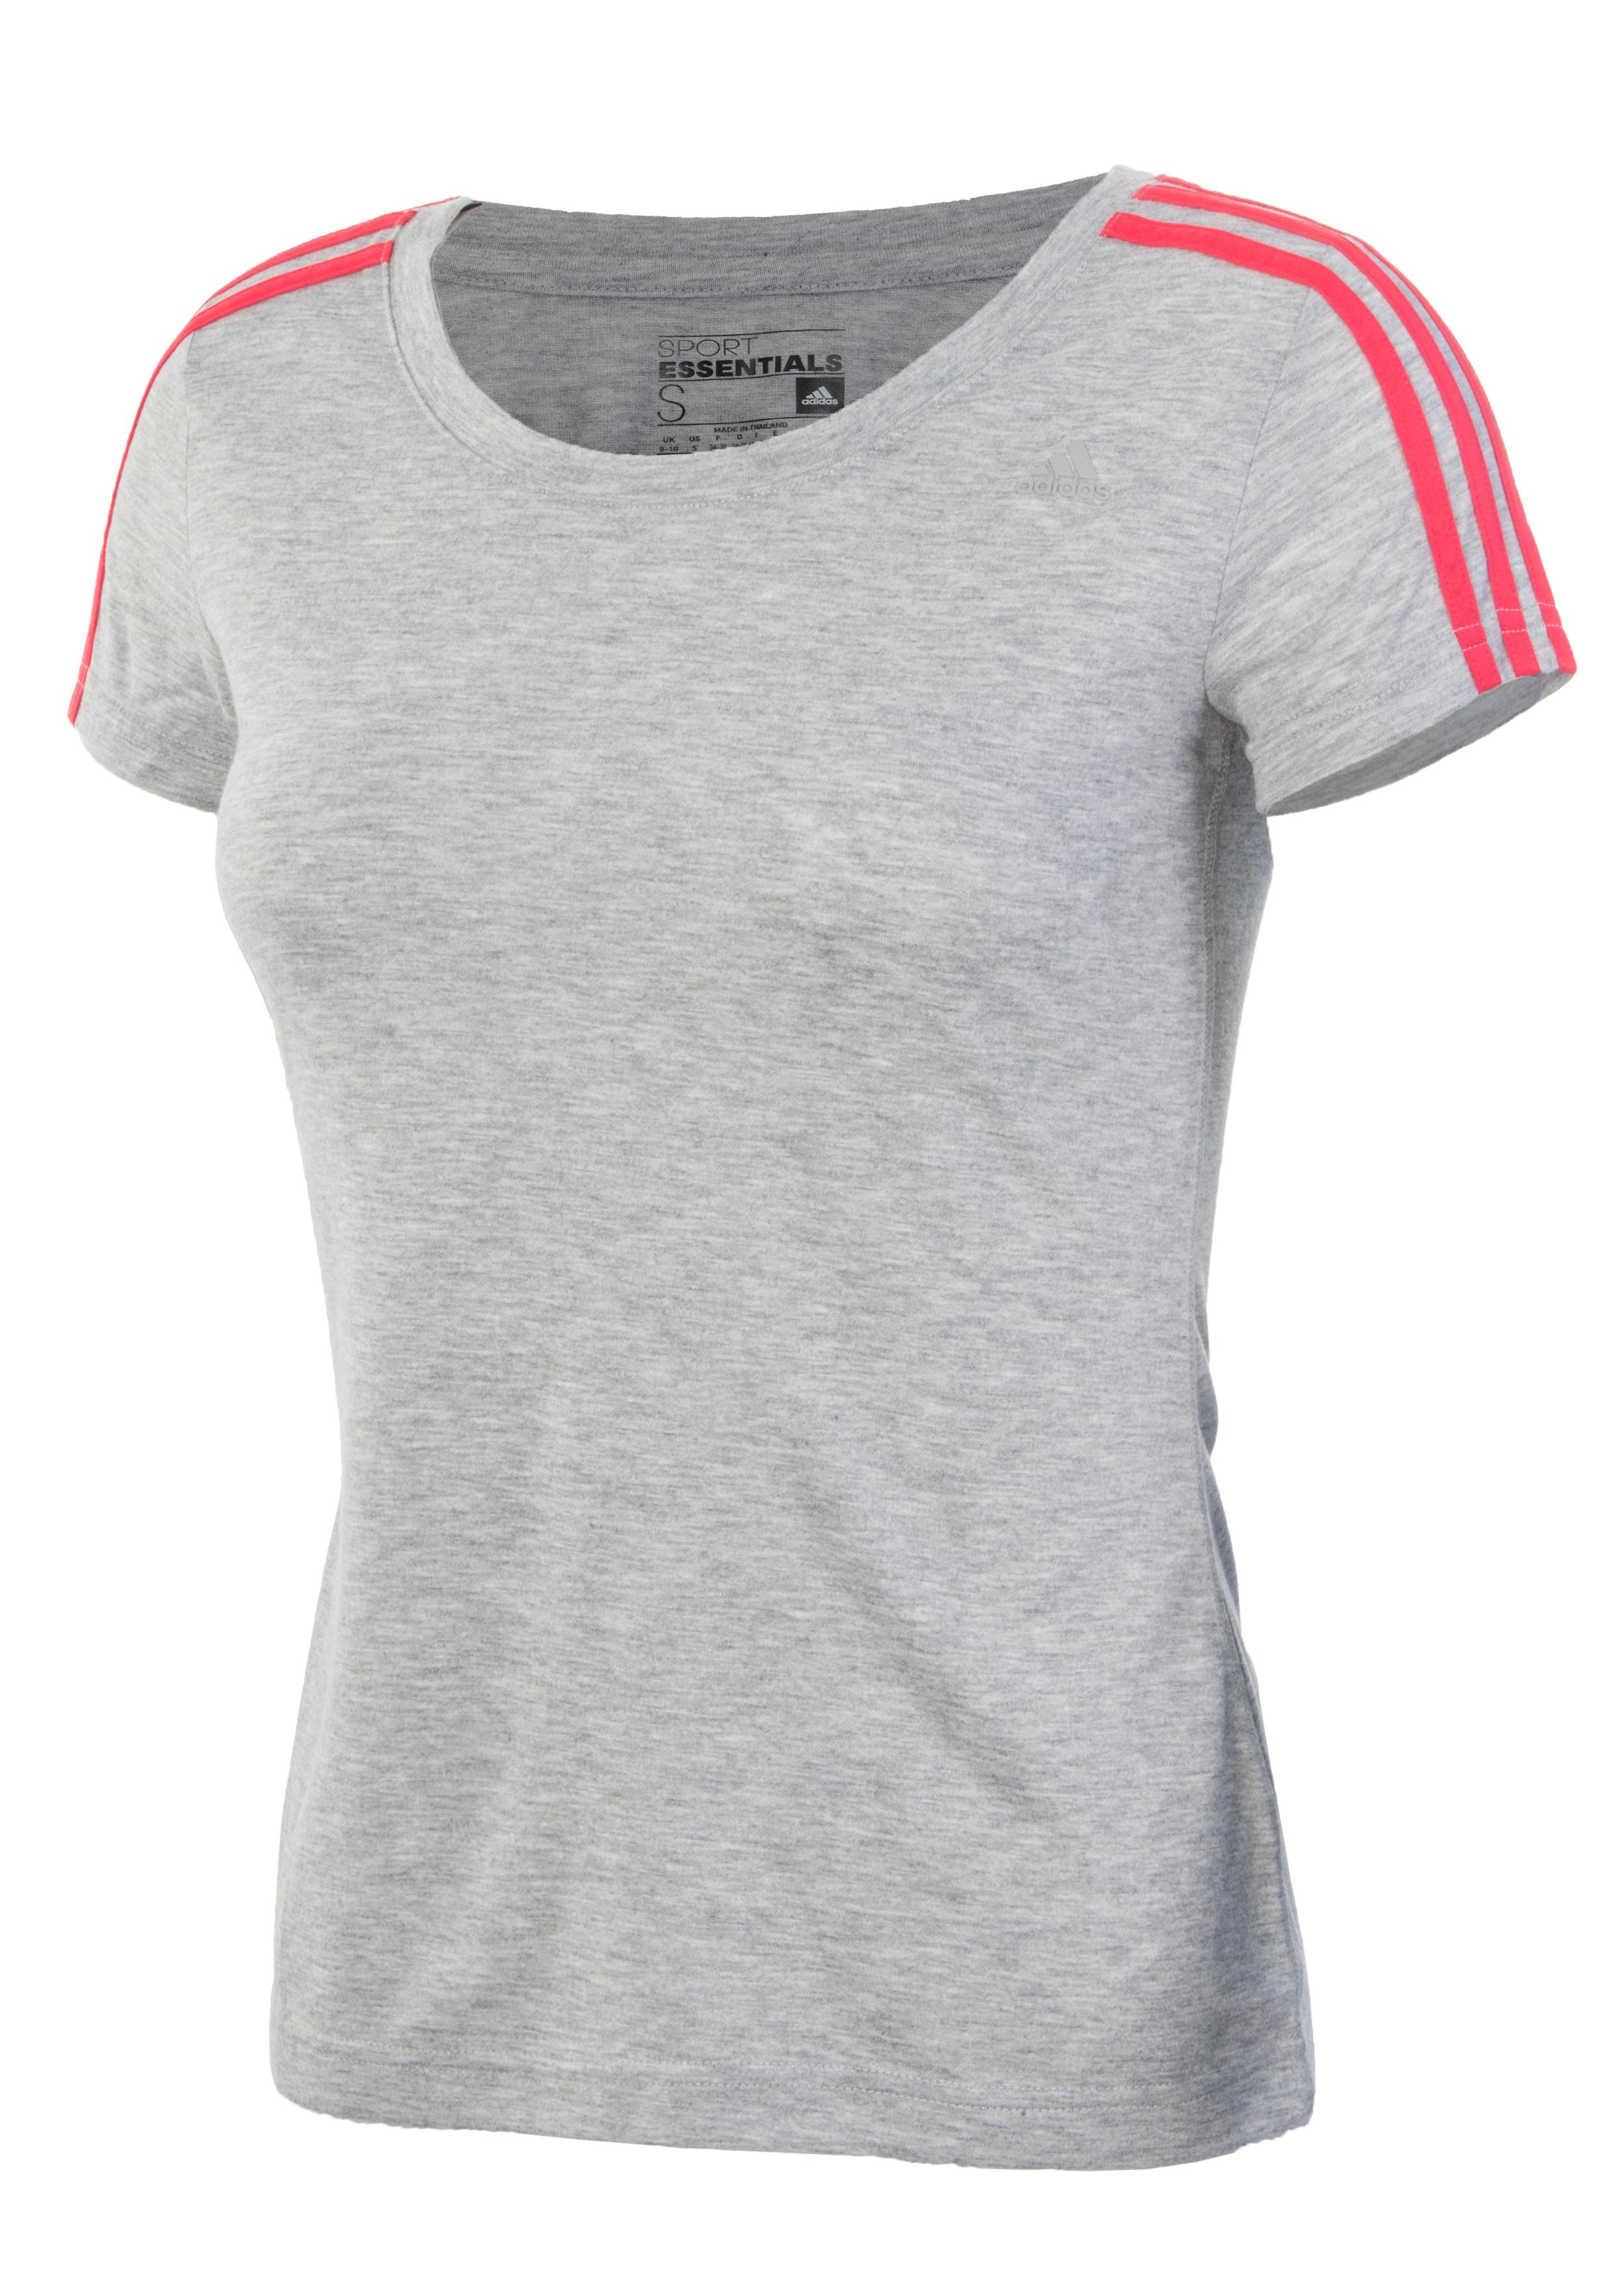 адидас футболки женские фото